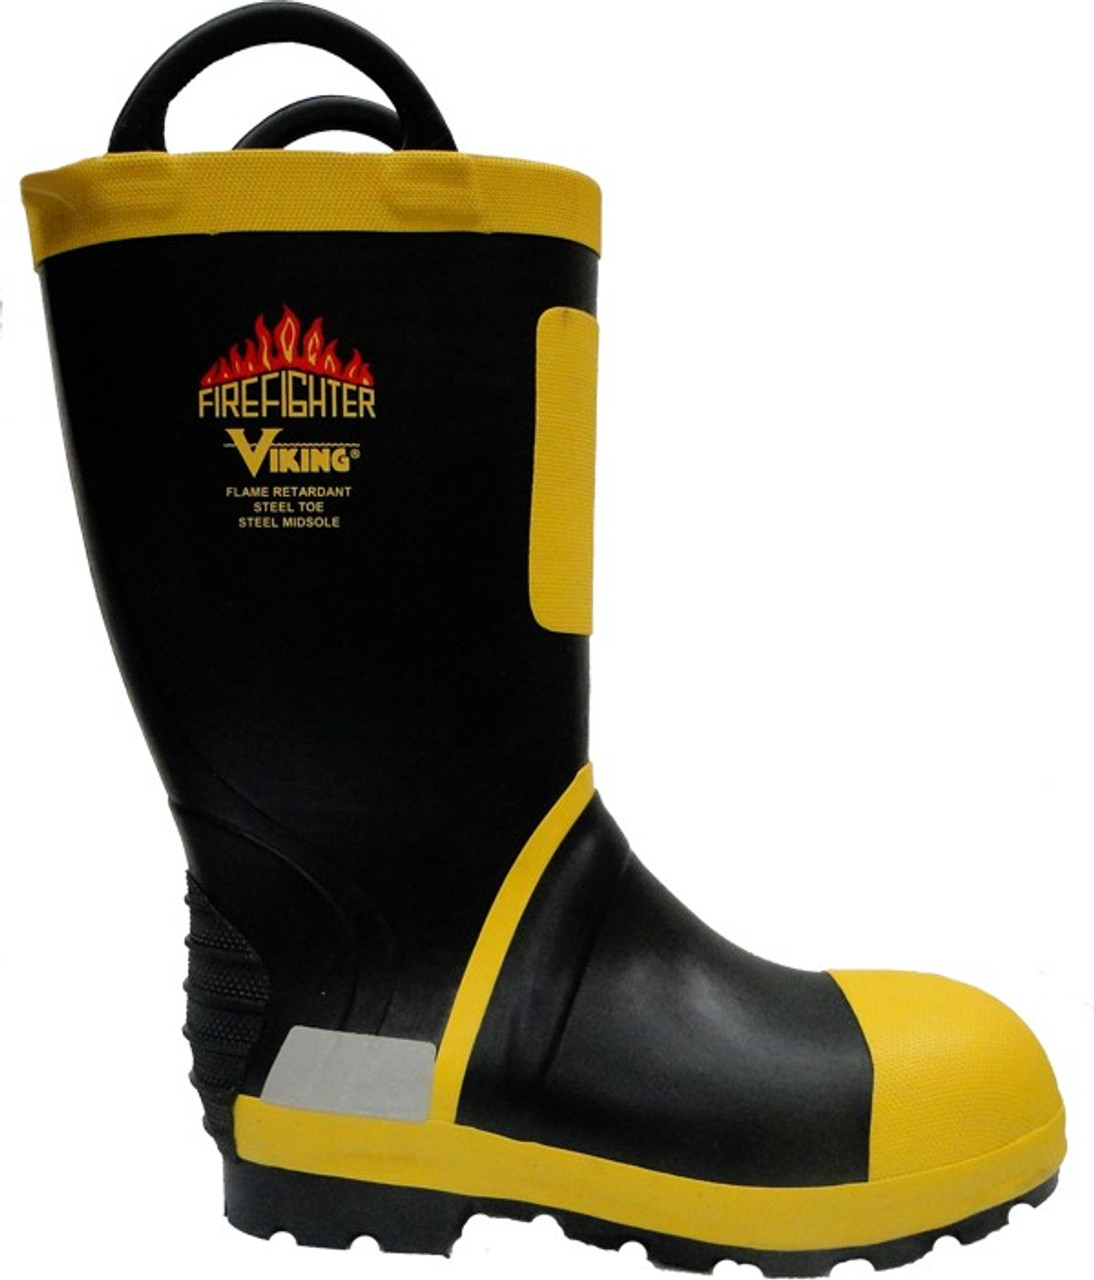 ae8d8bd6ec9 Firefighter Felt-Lined Safety Boot | FR, CSA Omega | Viking